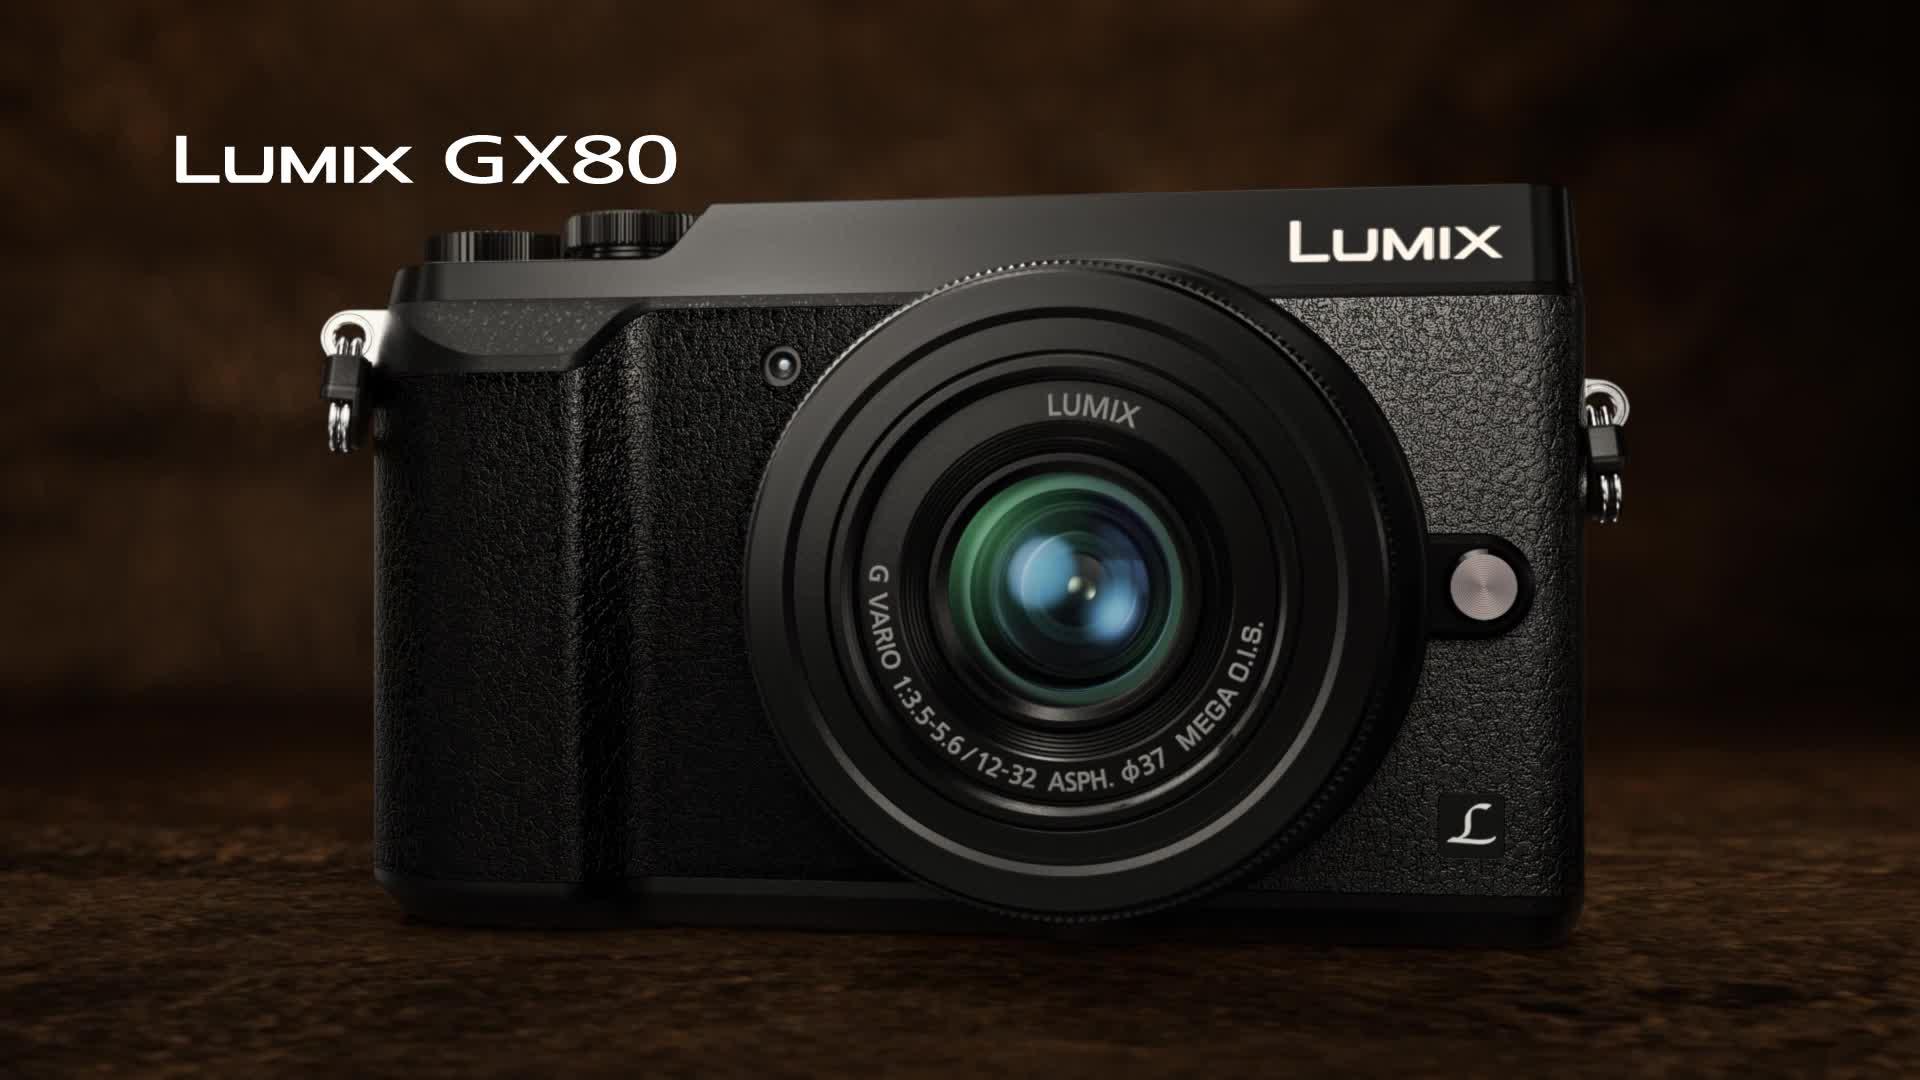 hybride lumix dmc gx80 objectif 12 32 mm noir appareil